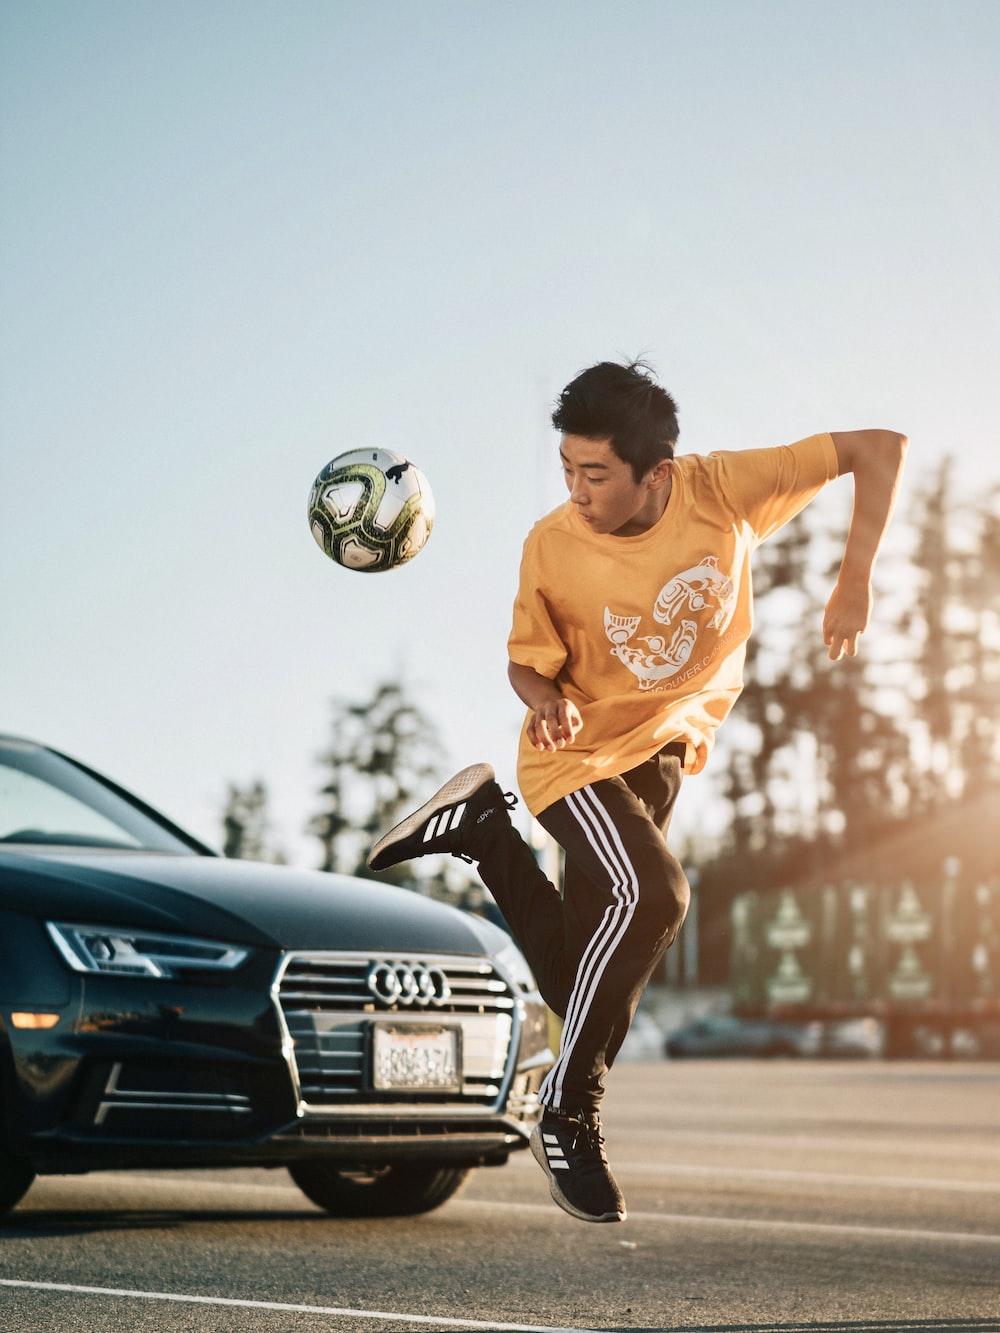 man in orange crew neck t-shirt and black shorts playing soccer during daytime